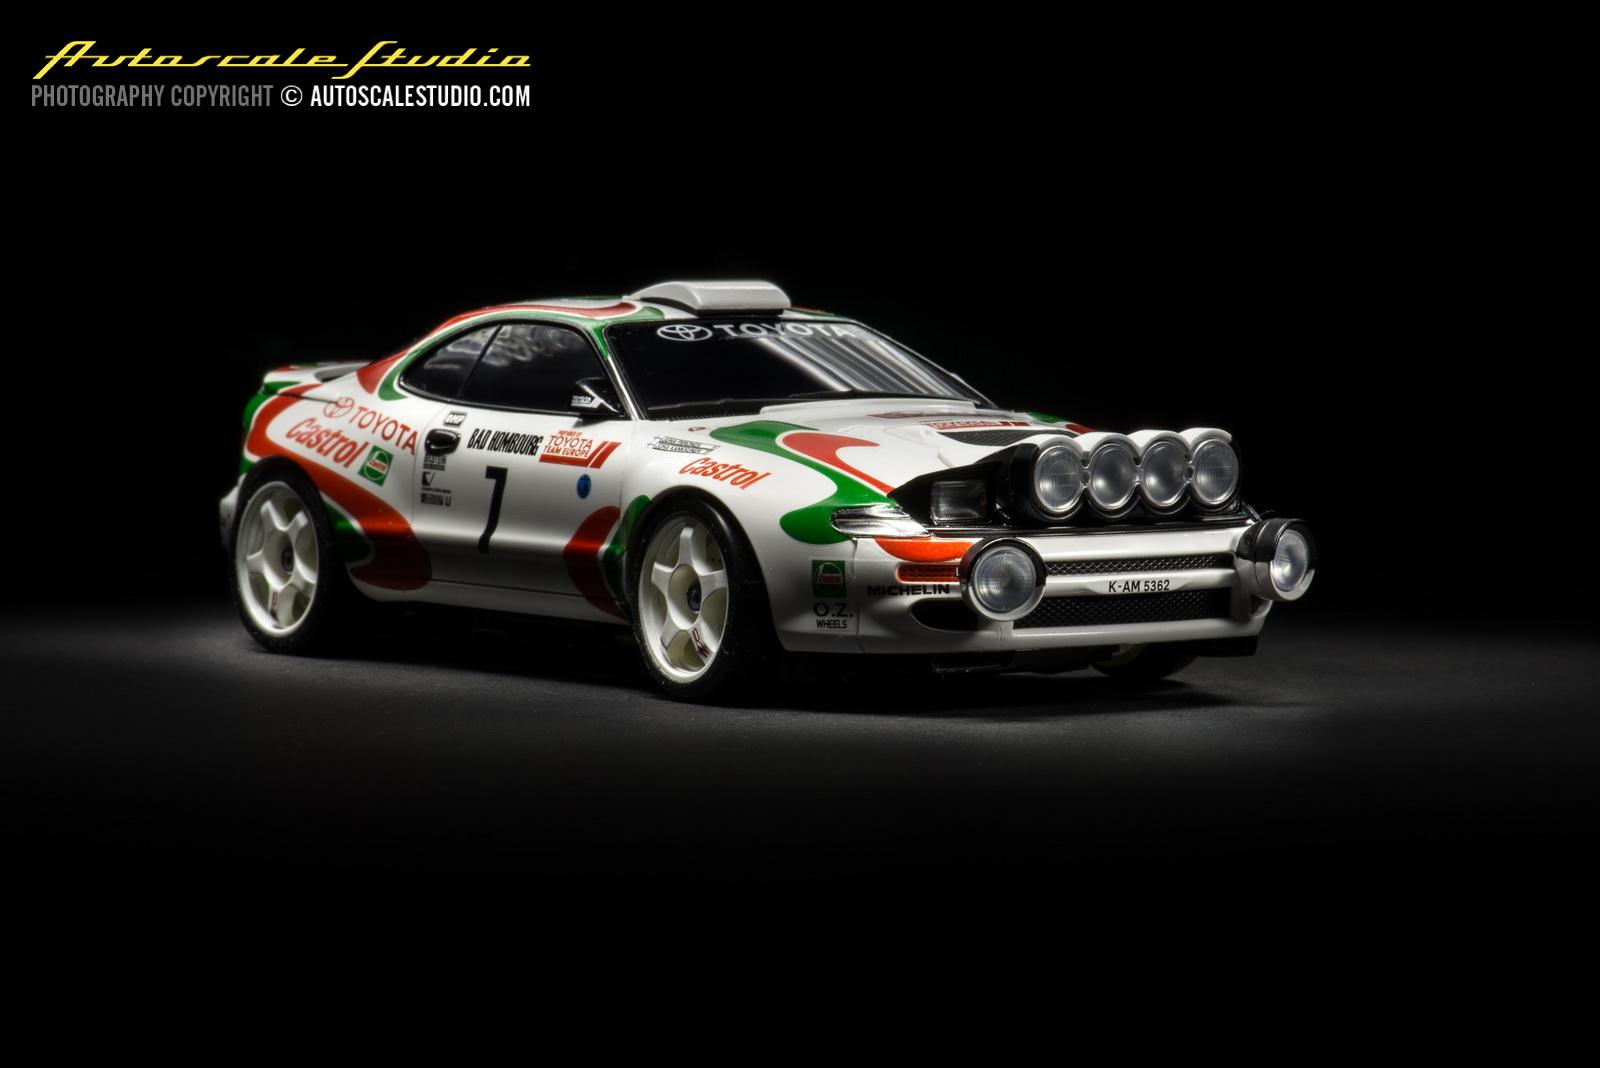 Kelebihan Kekurangan Toyota Celica 1993 Perbandingan Harga